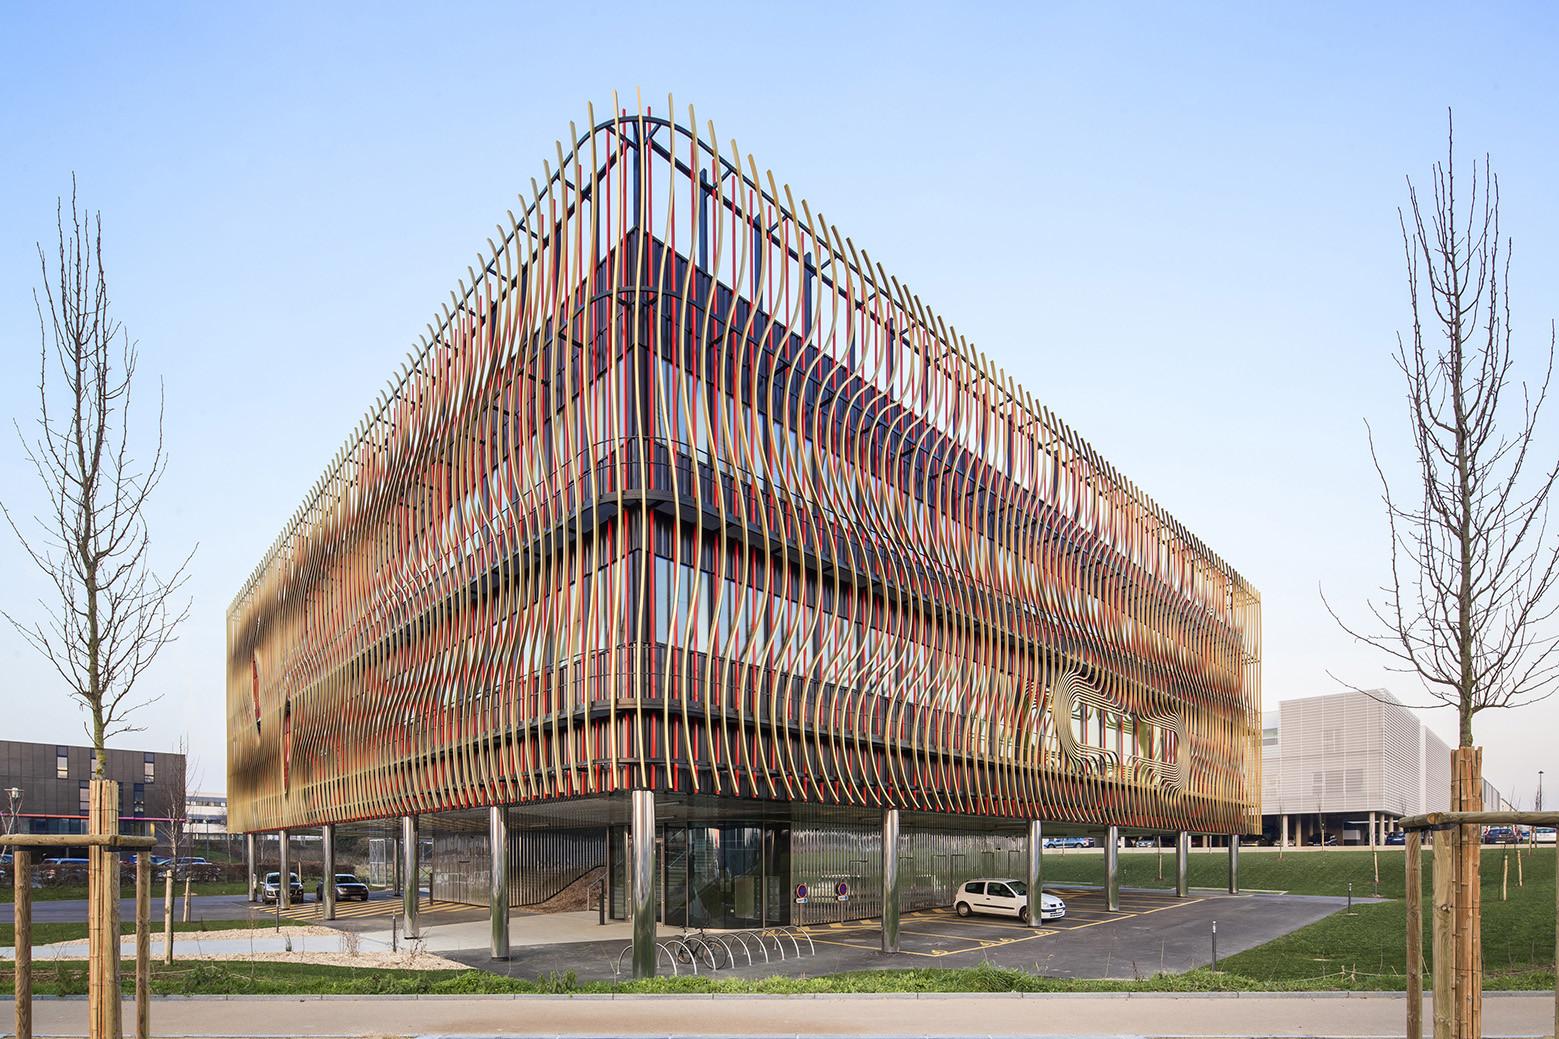 BIOPOLE Biotech Business Incubator / PERIPHERIQUES Architectes, © Luc Boegly